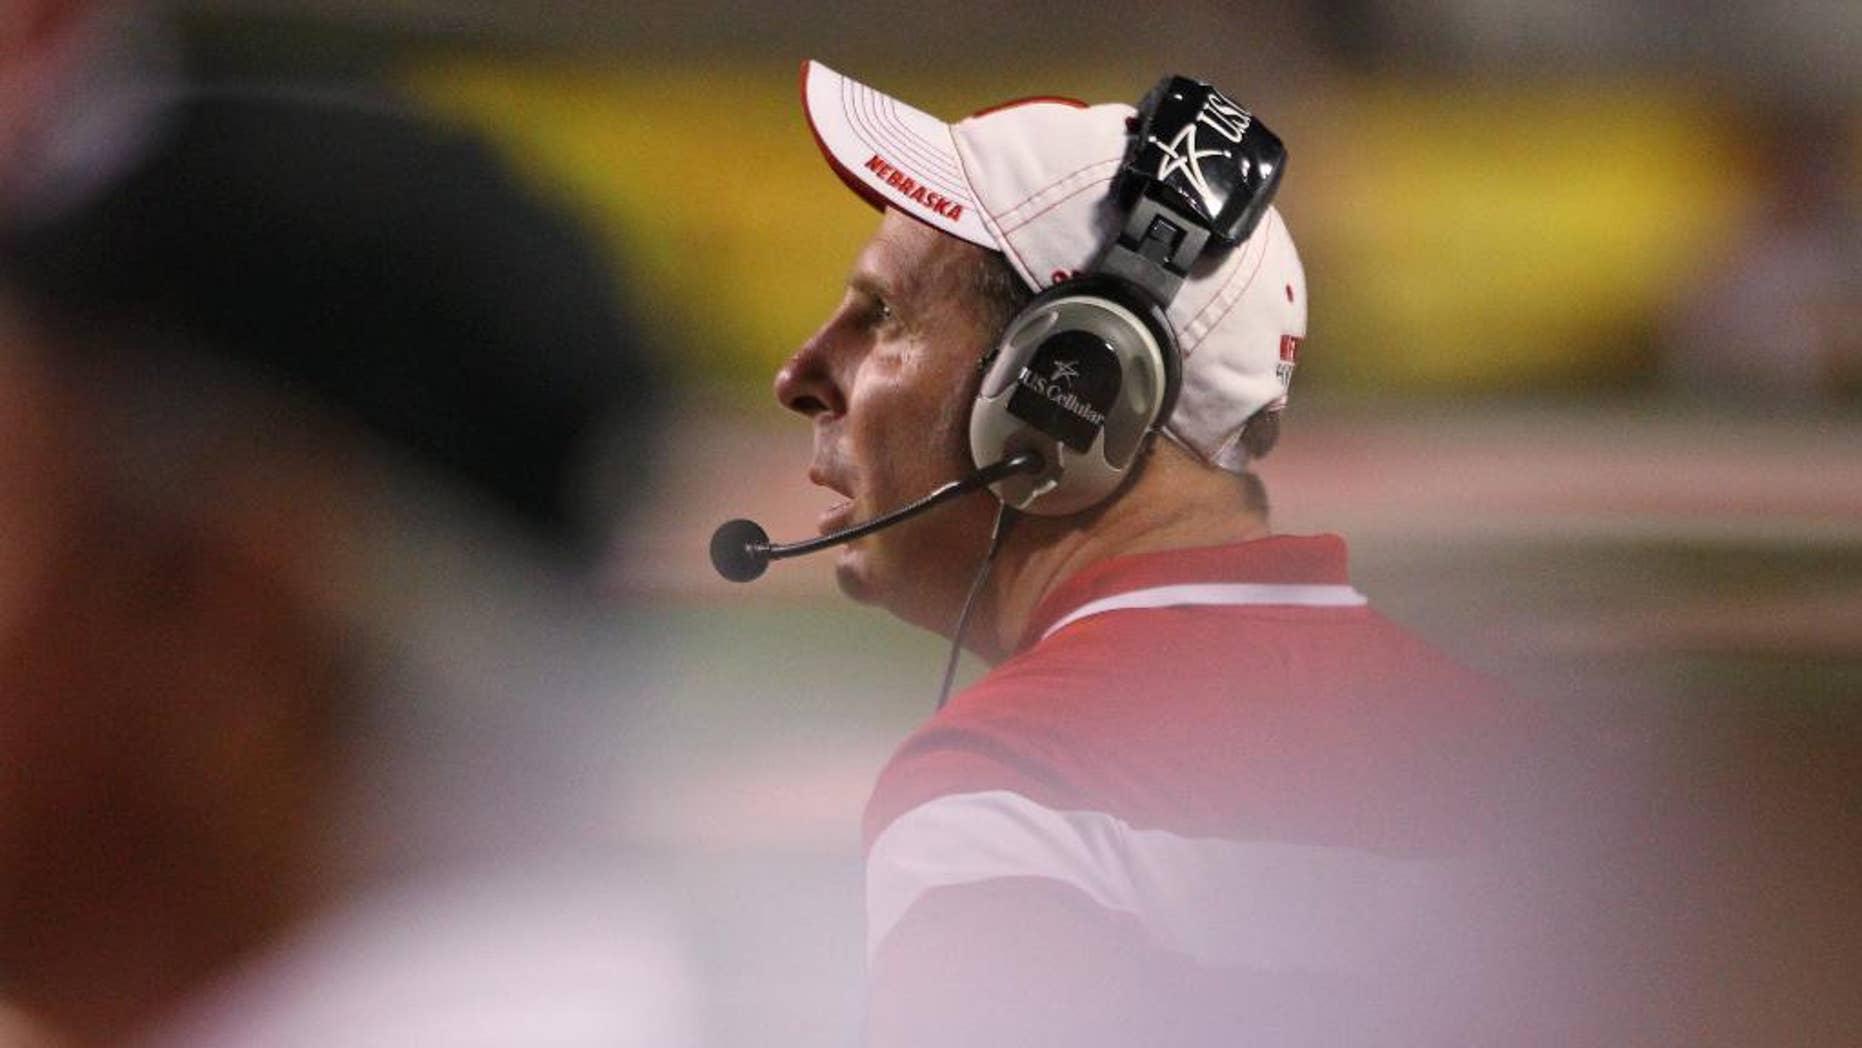 Nebraska's Bo Pelini checks the scoreboard against Fresno State in the second half of an NCAA college football game in Fresno, Calif., Saturday, Sept. 13, 2014. (AP Photo/Gary Kazanjian)